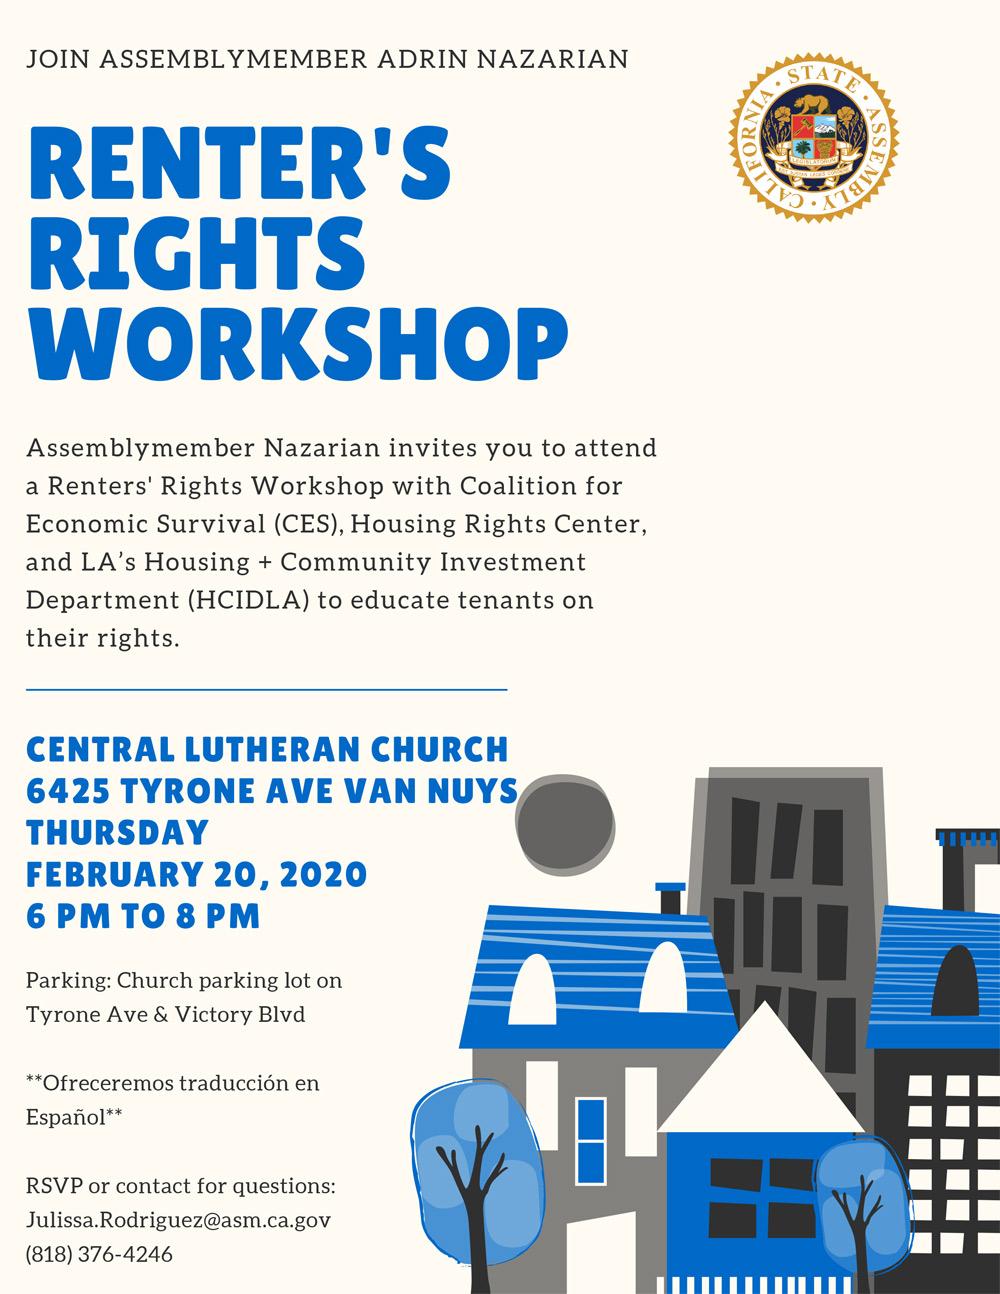 Renter's Rights Workshop